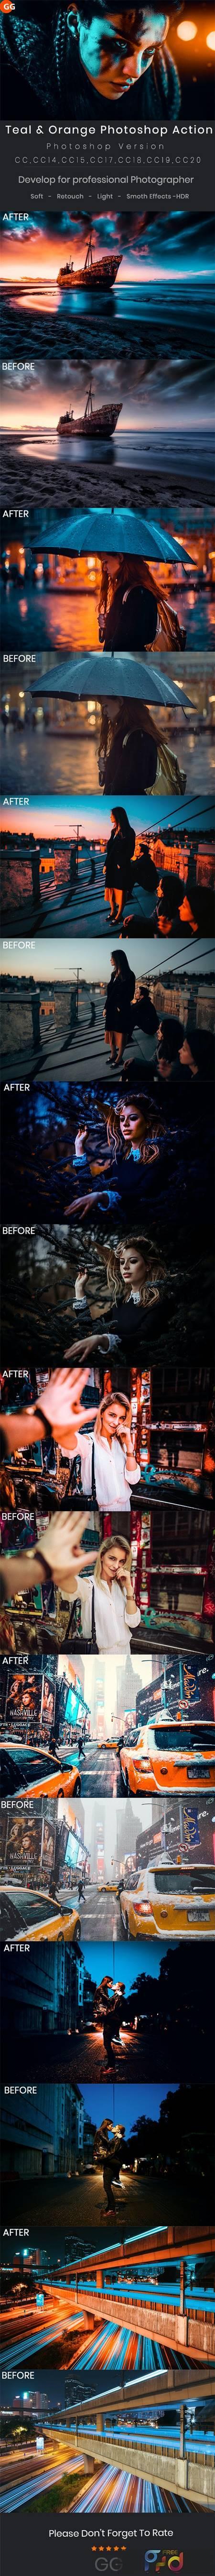 Teal & Orange Photoshop Action 28975559 1